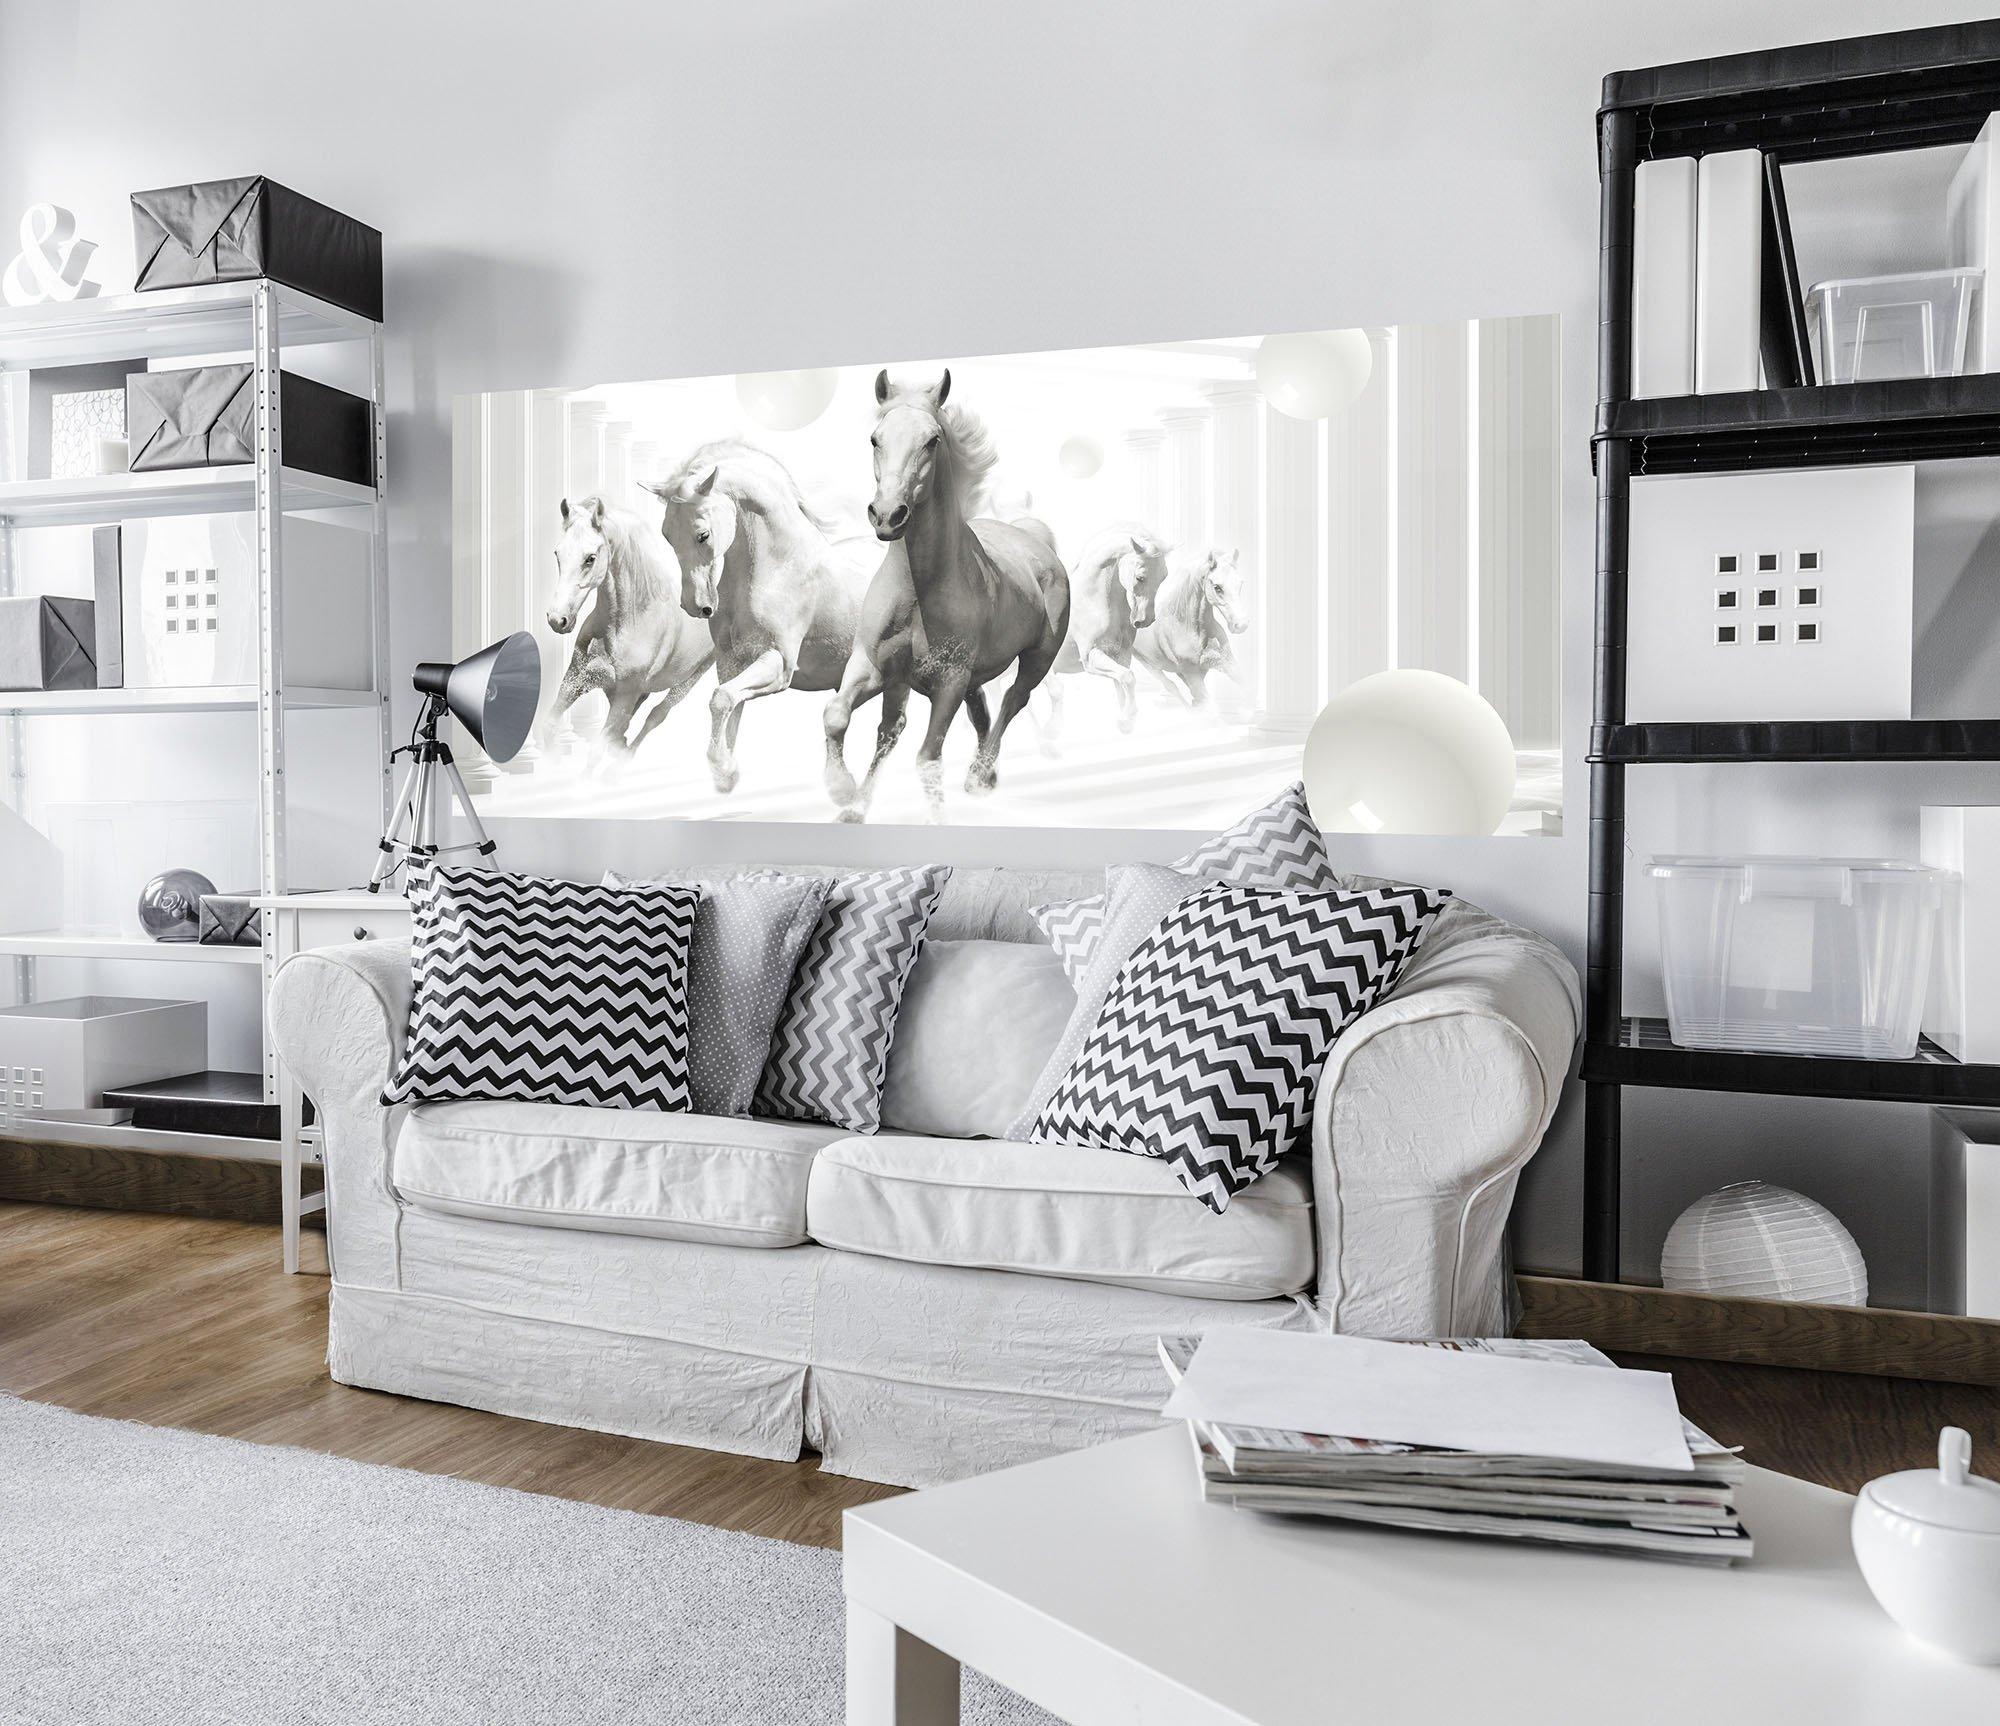 panorama fototapete mit galoppierenden wei en pferden. Black Bedroom Furniture Sets. Home Design Ideas